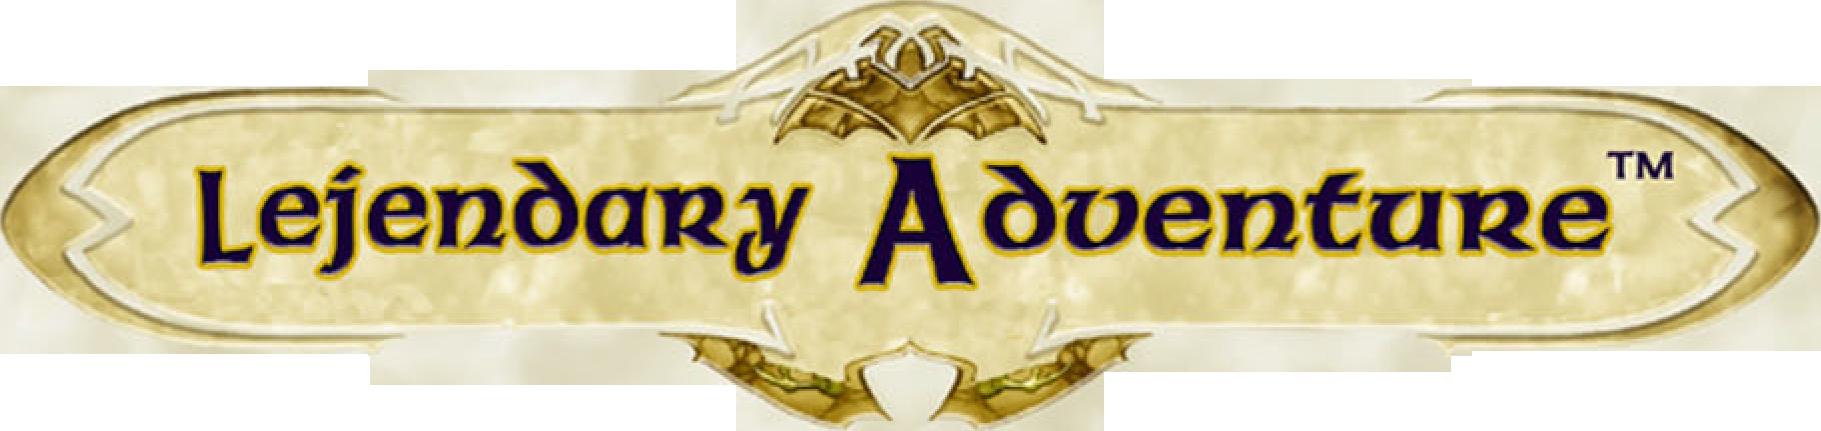 Lejendary Adventure